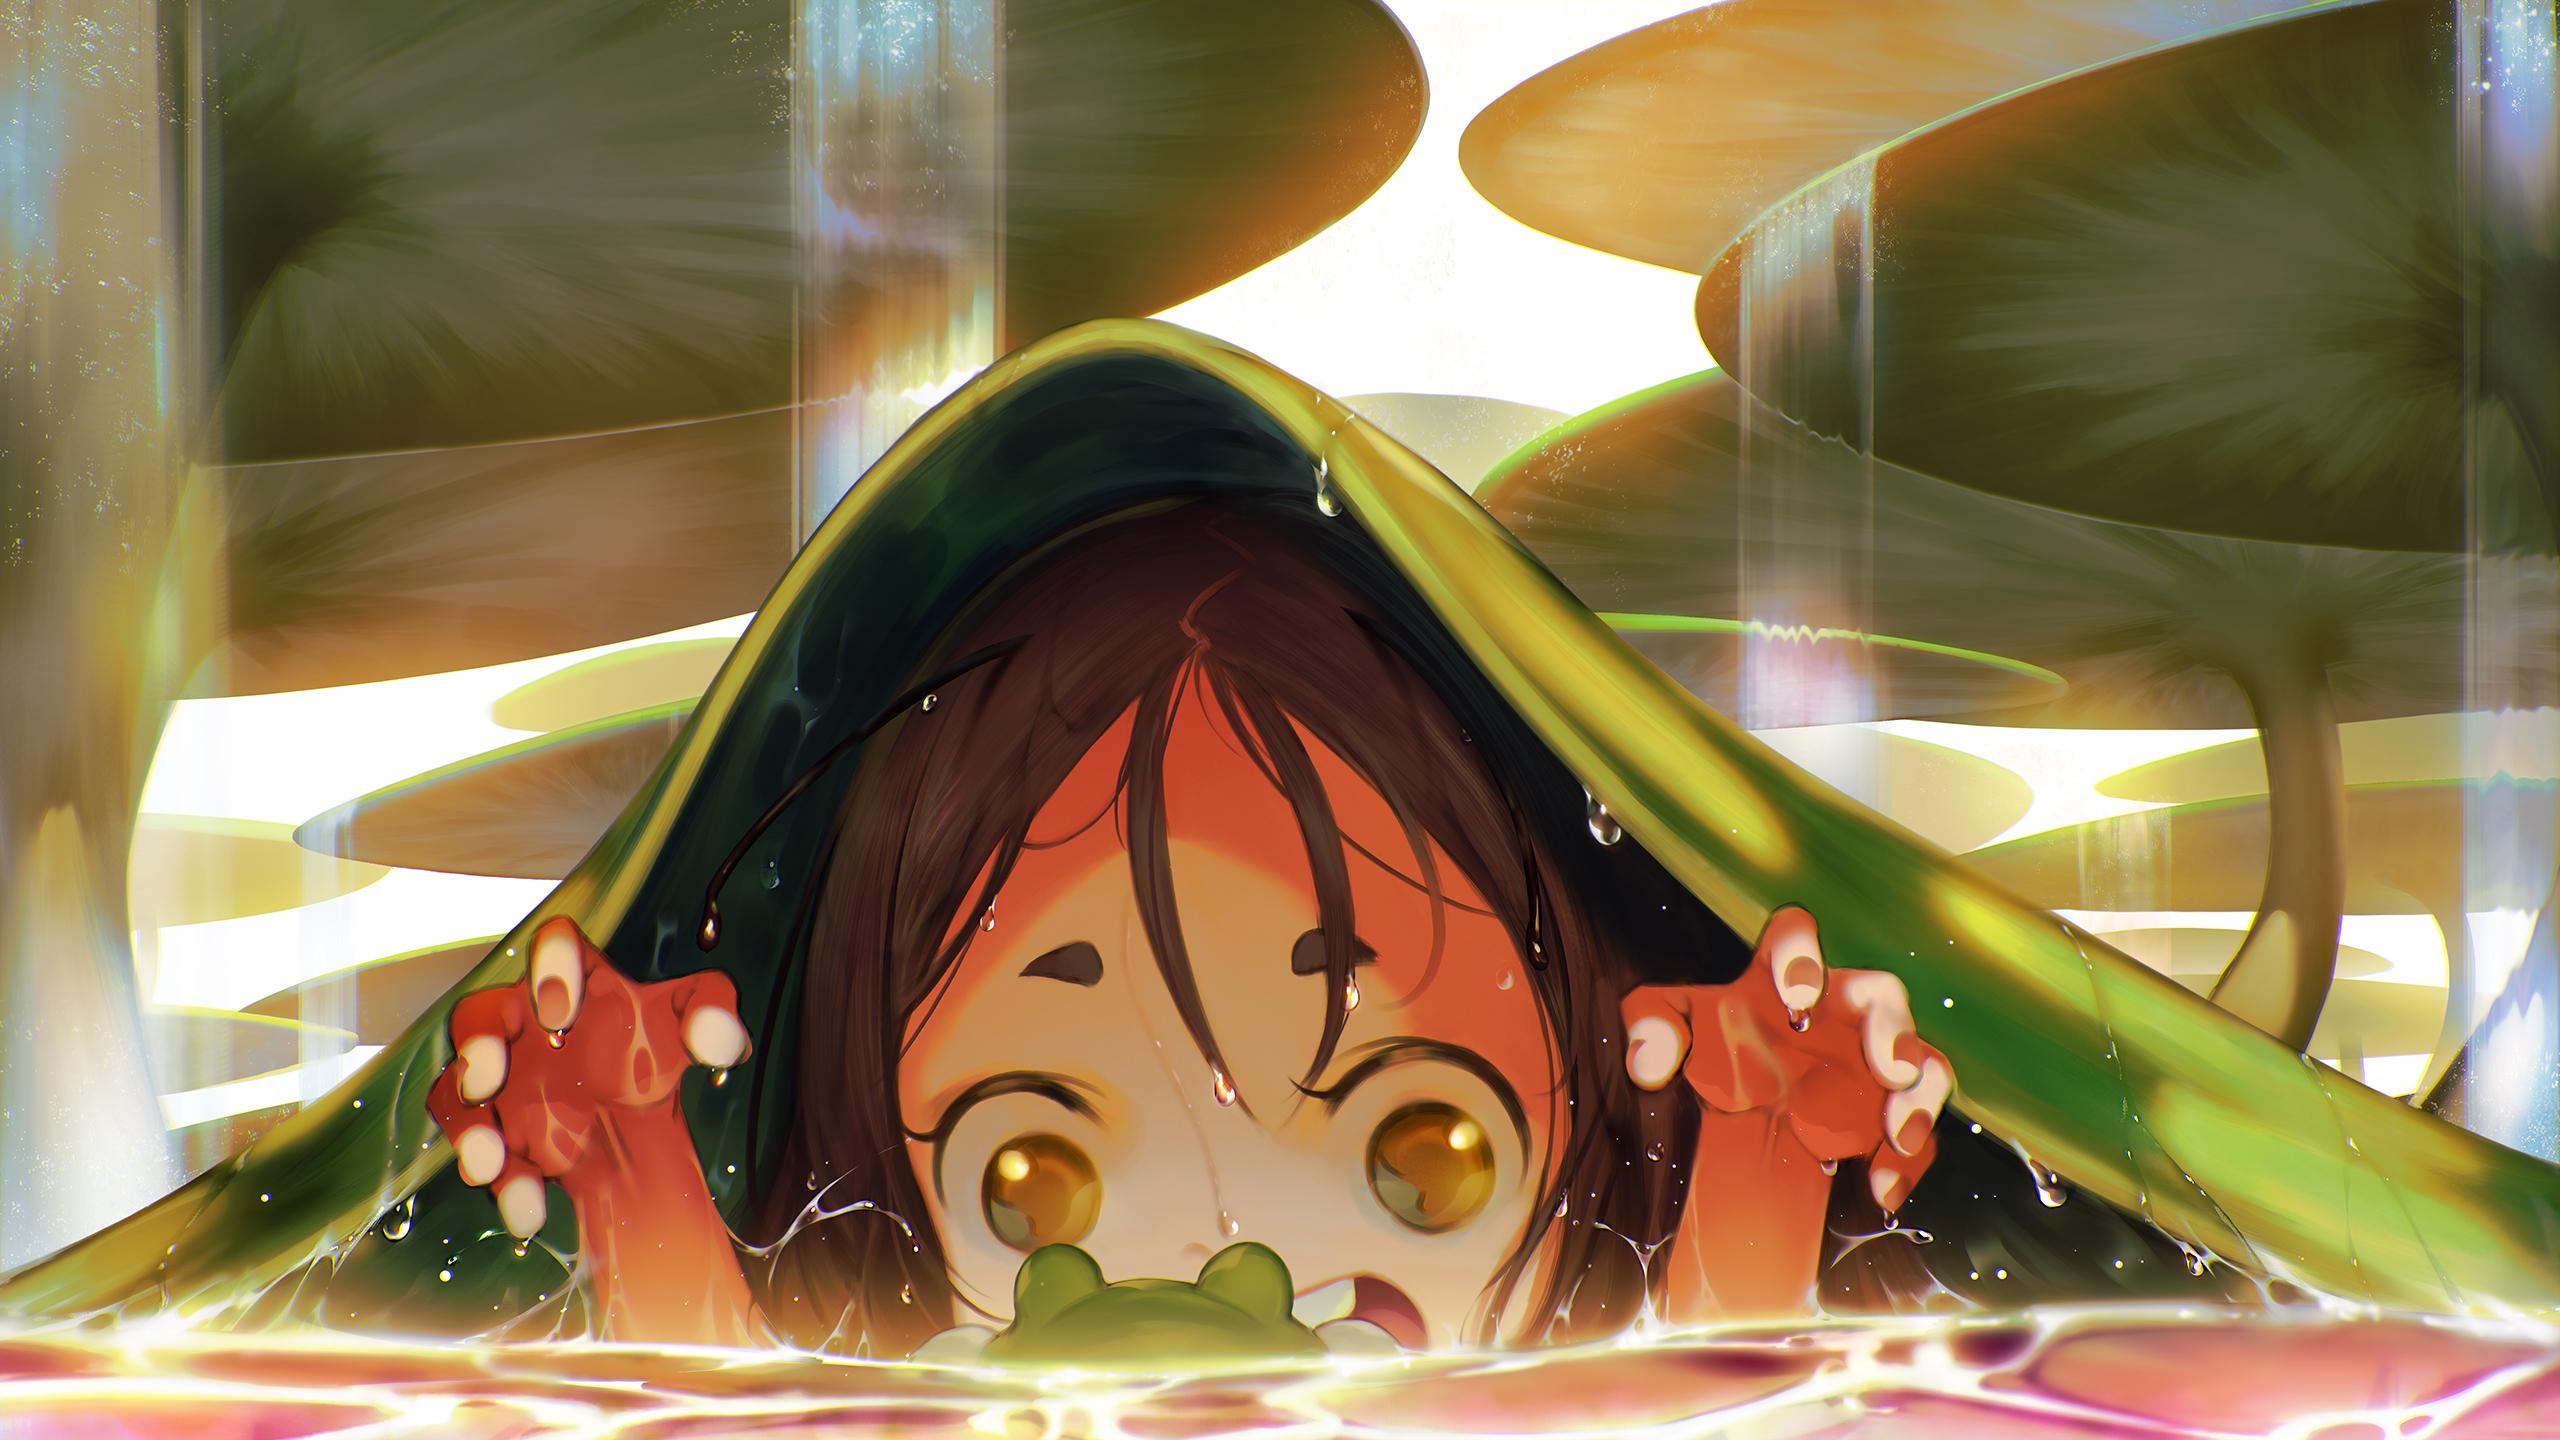 Fantasy Art Frog Brunette Yellow Eyes Water Lilies Water Drops Teeth Anime Girls Blueorca 2560x1440